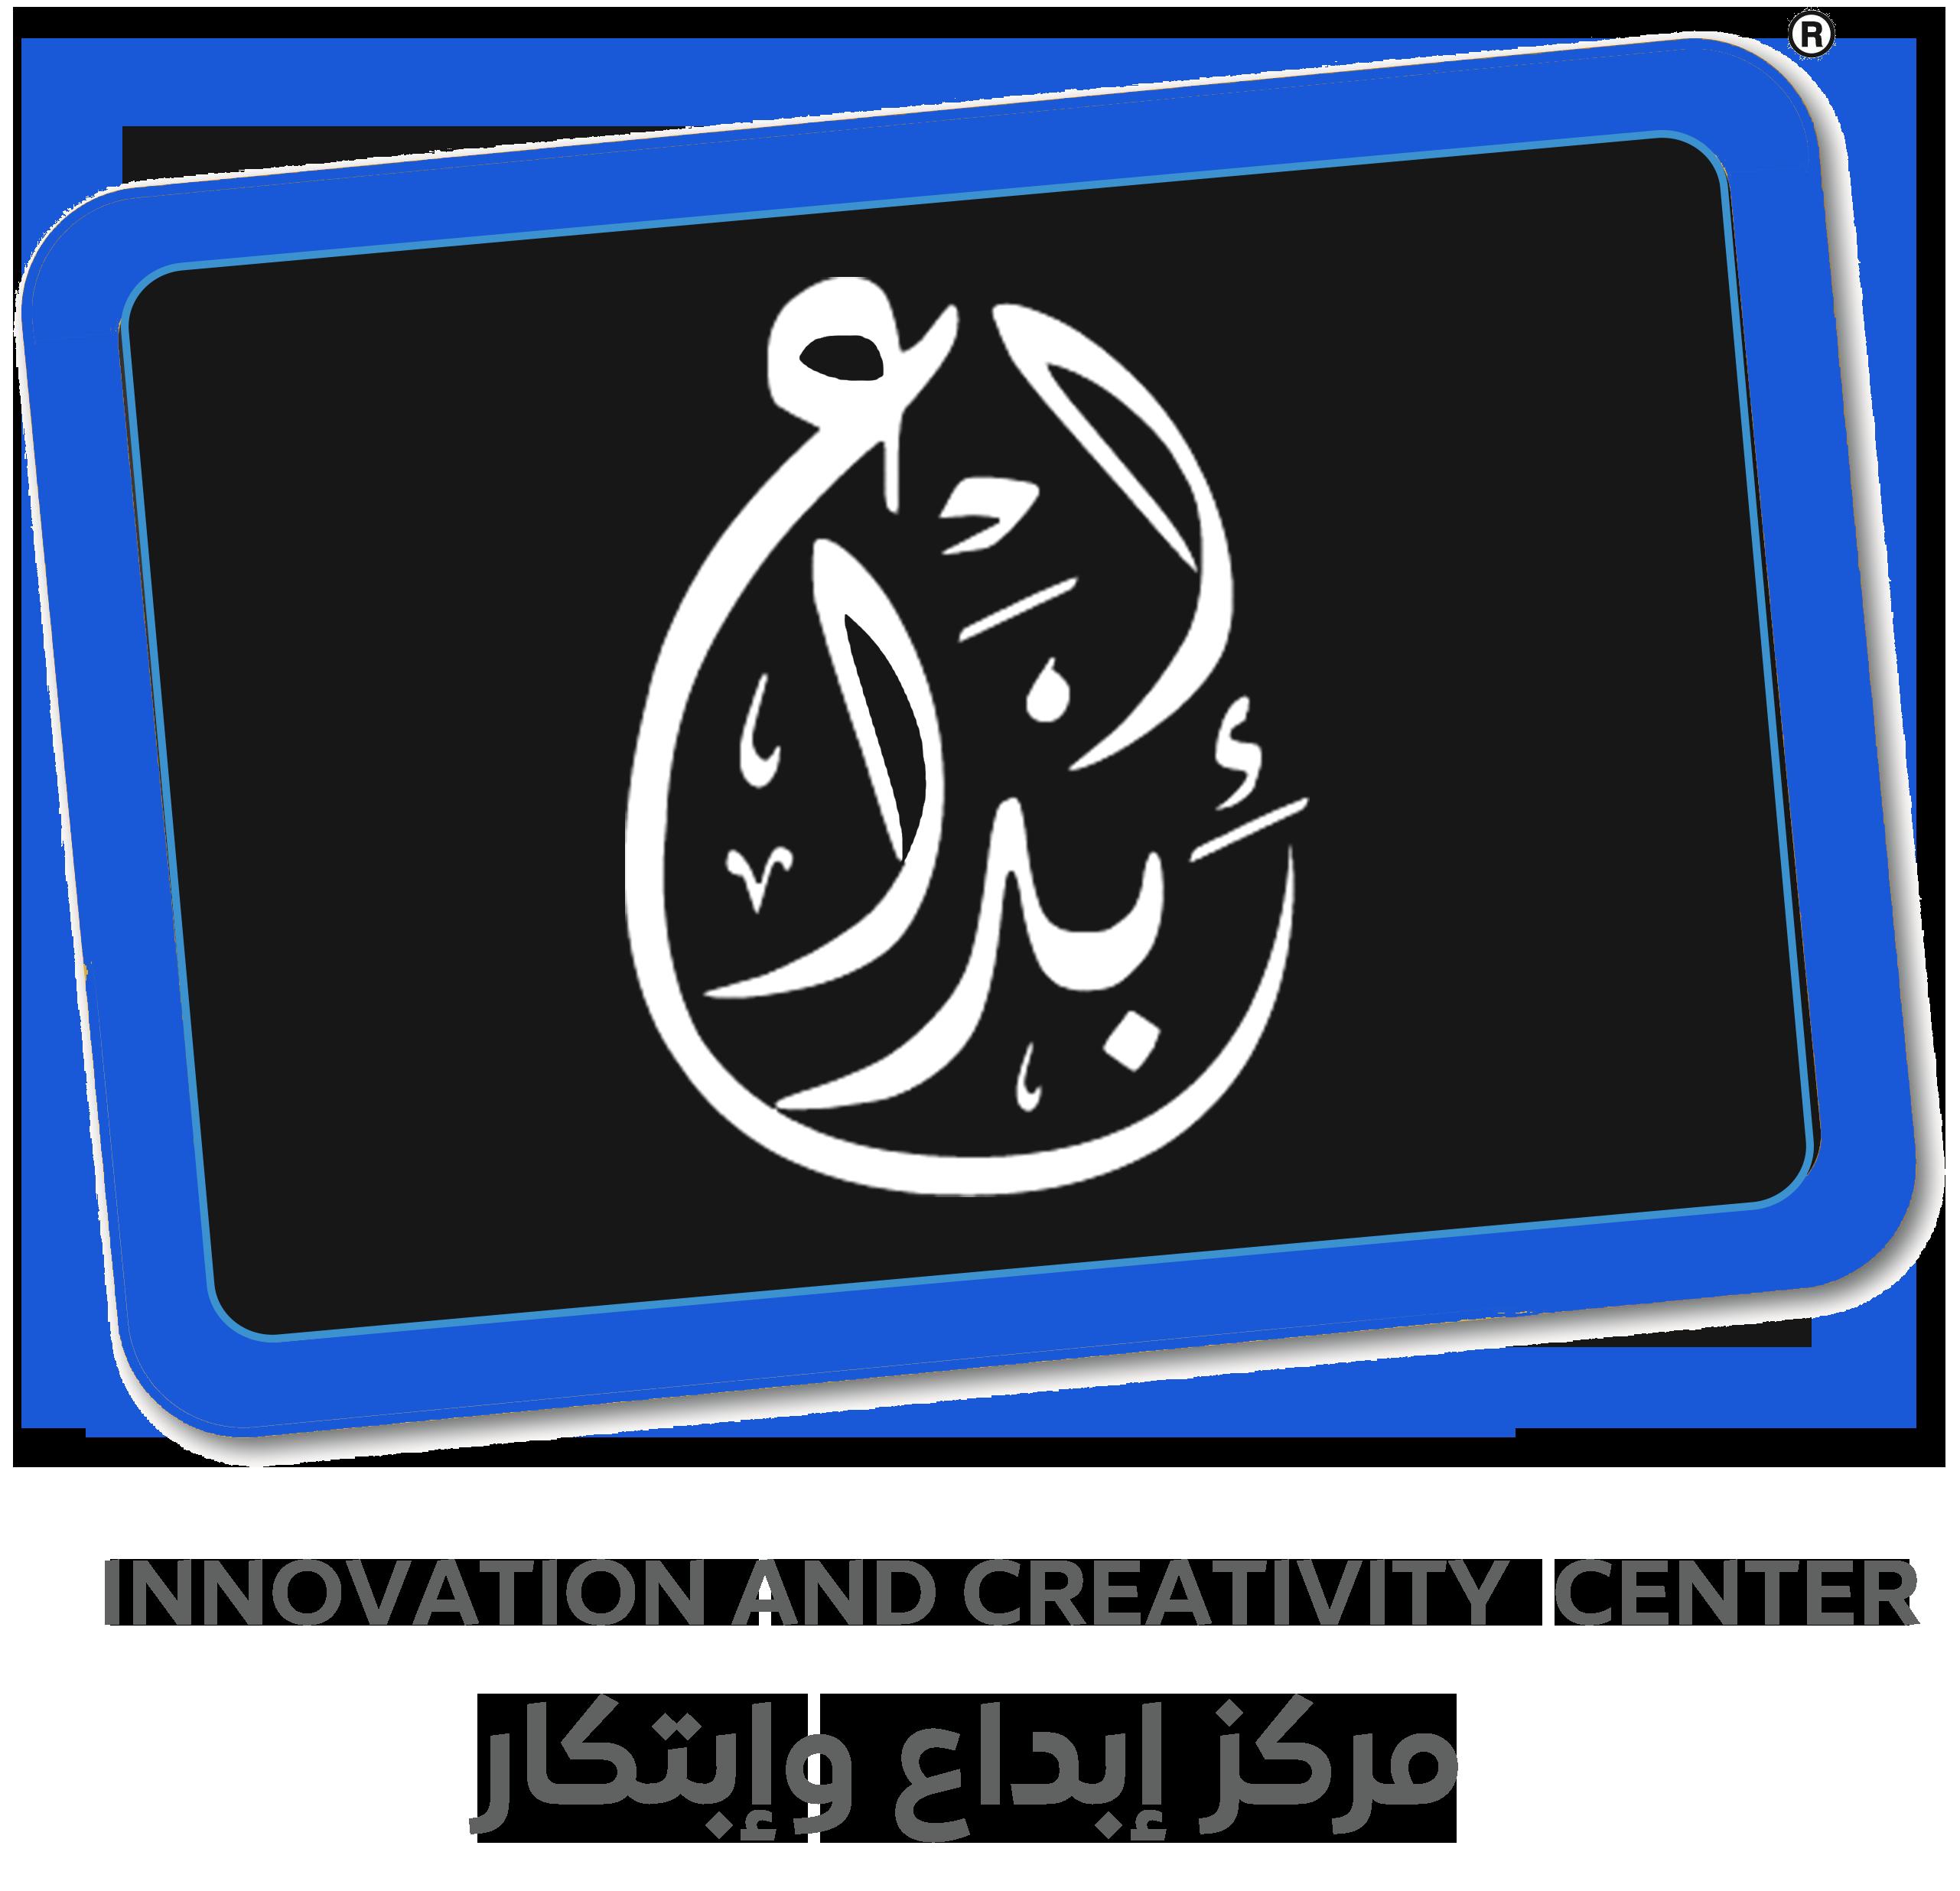 creativity and innovation center